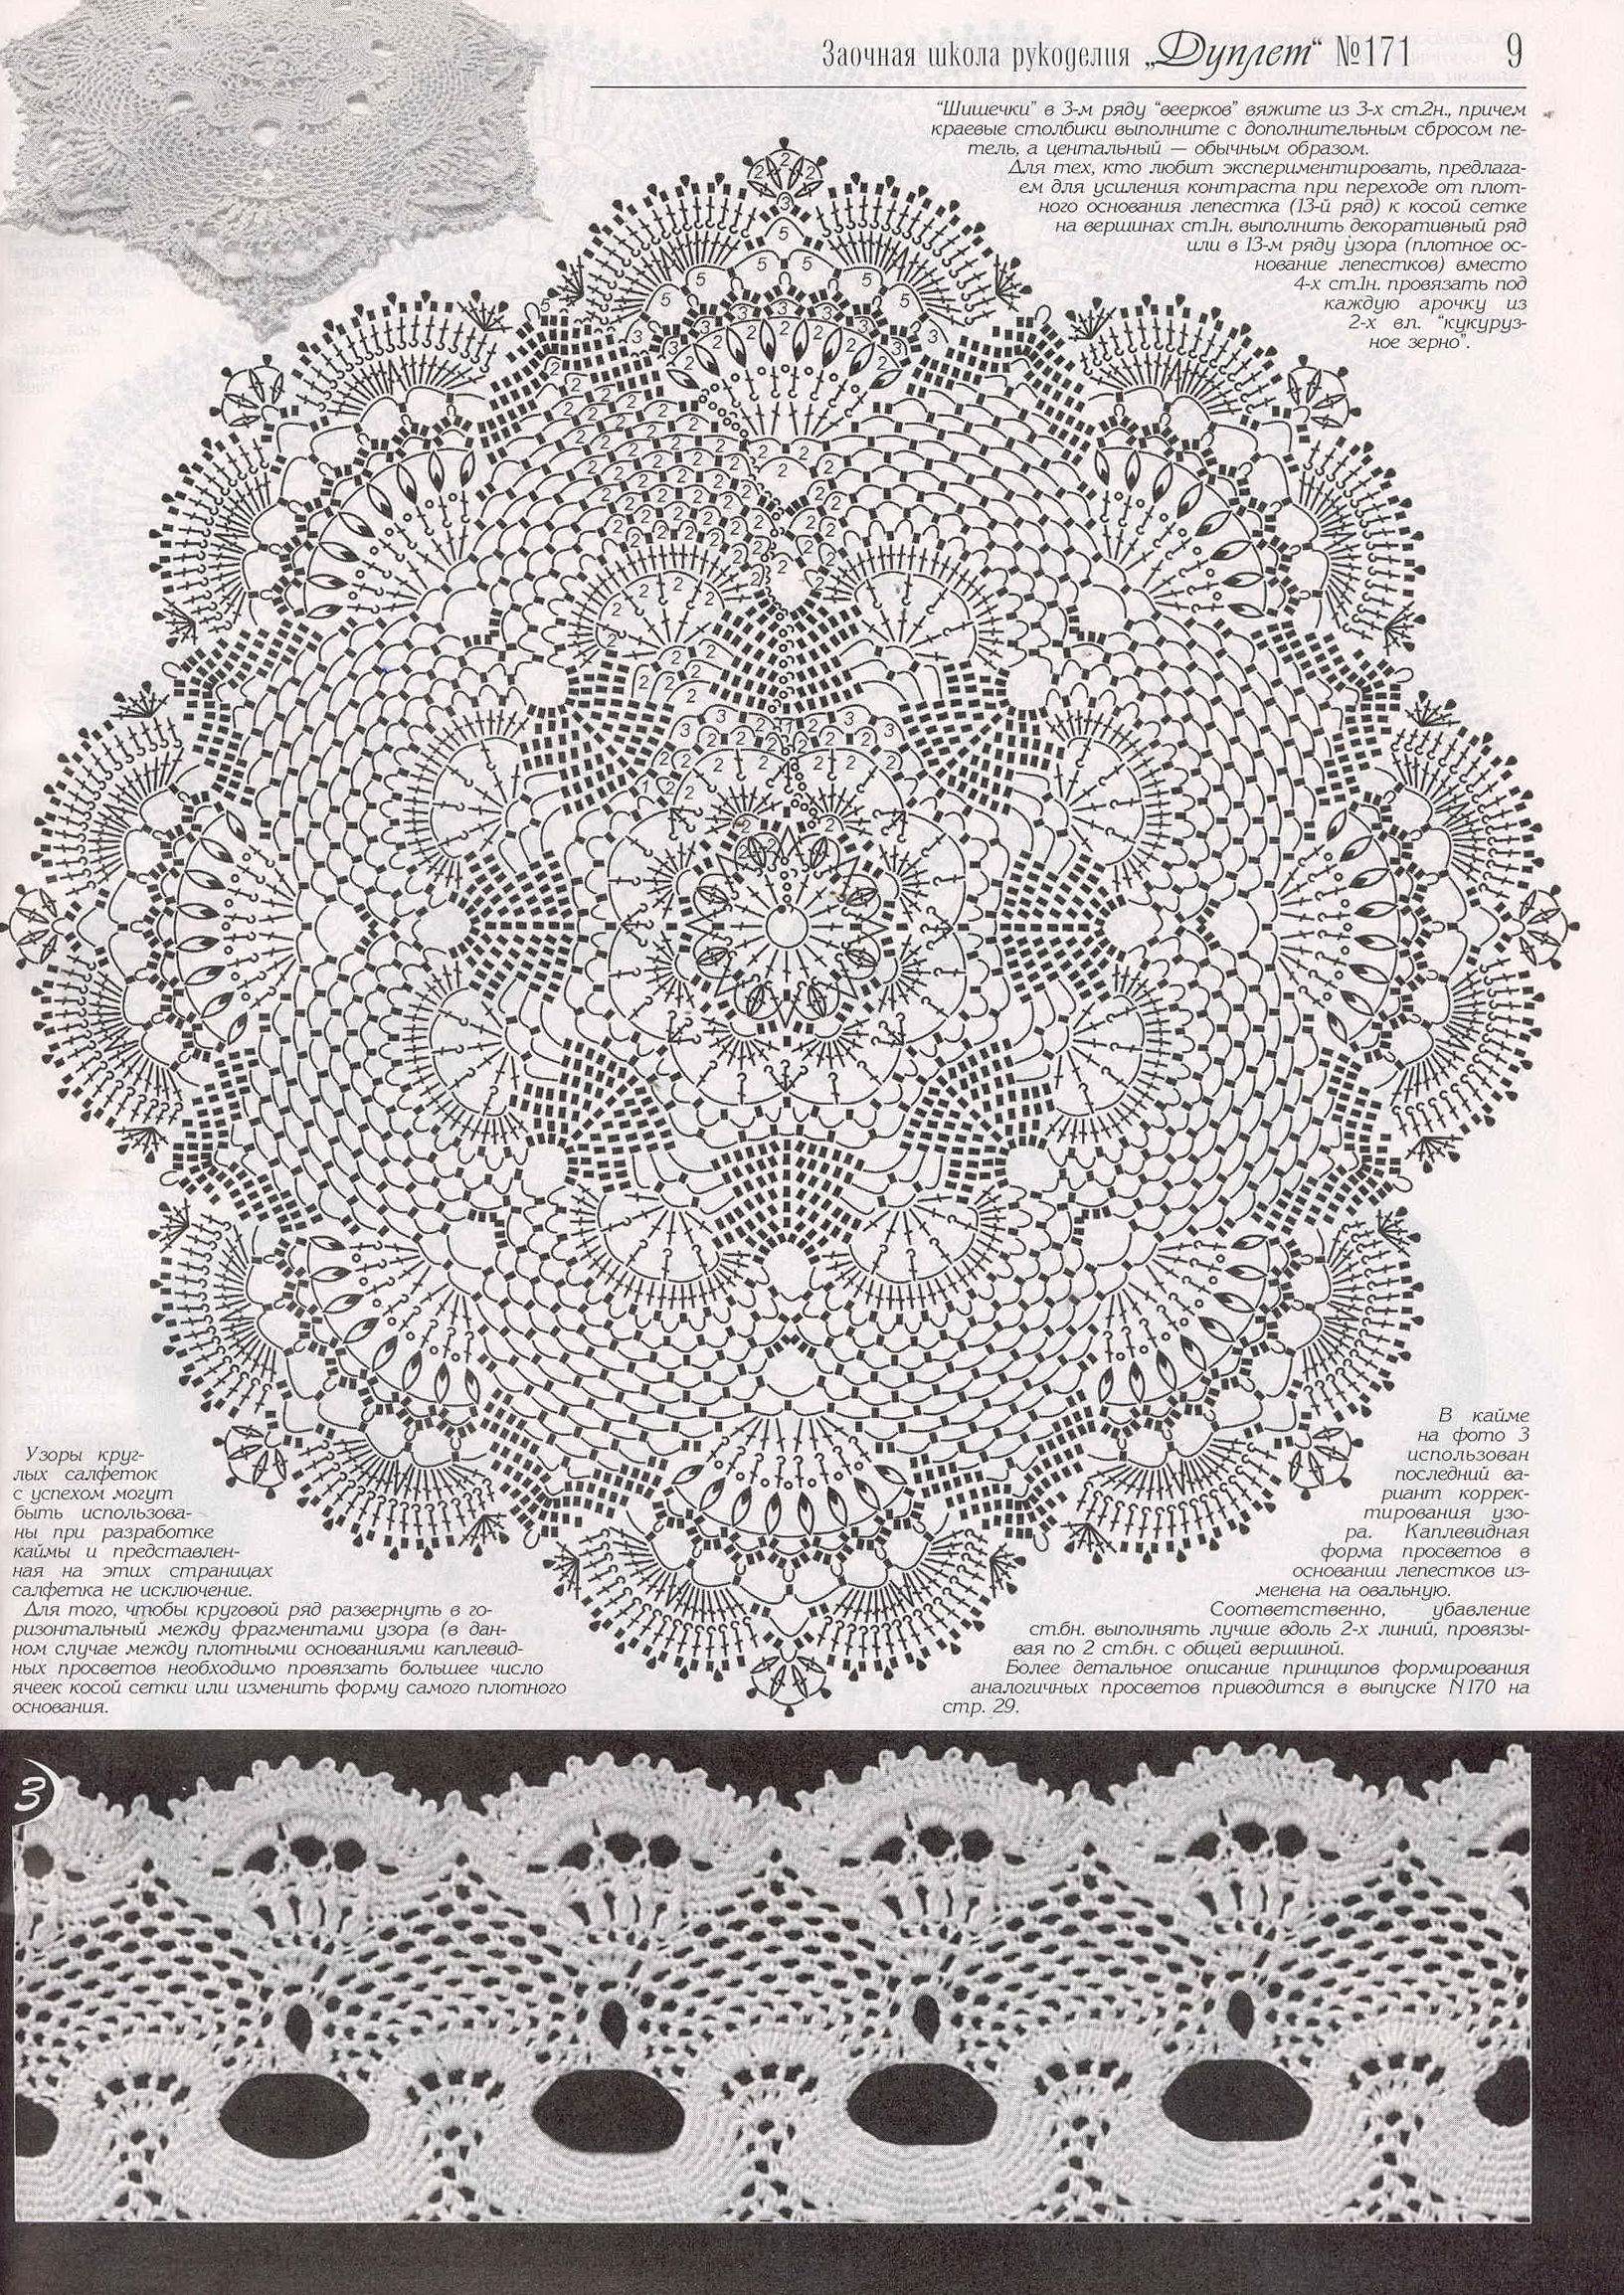 0_10da20_e769816a_orig (1633×2308)   knitted doily   Pinterest ...